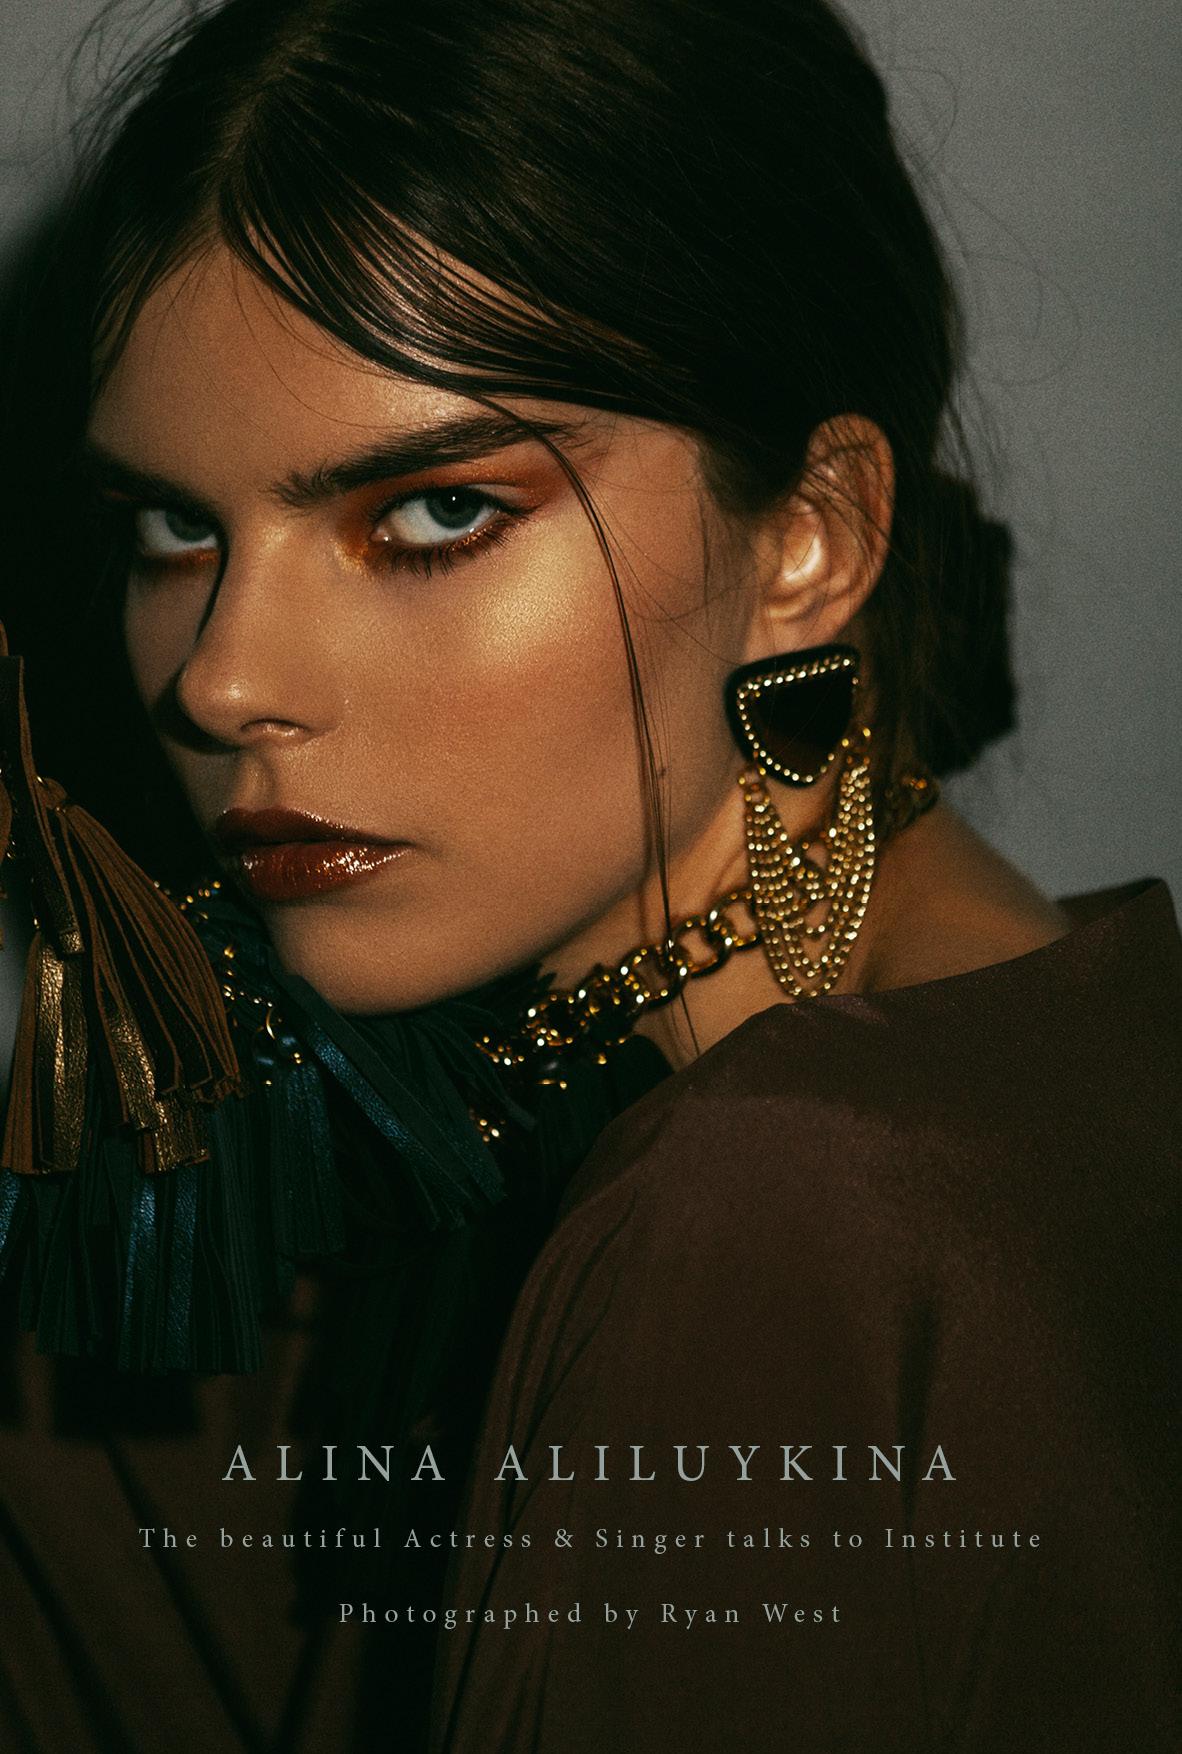 Images Alina Aliluykina nudes (71 foto and video), Topless, Sideboobs, Instagram, underwear 2020